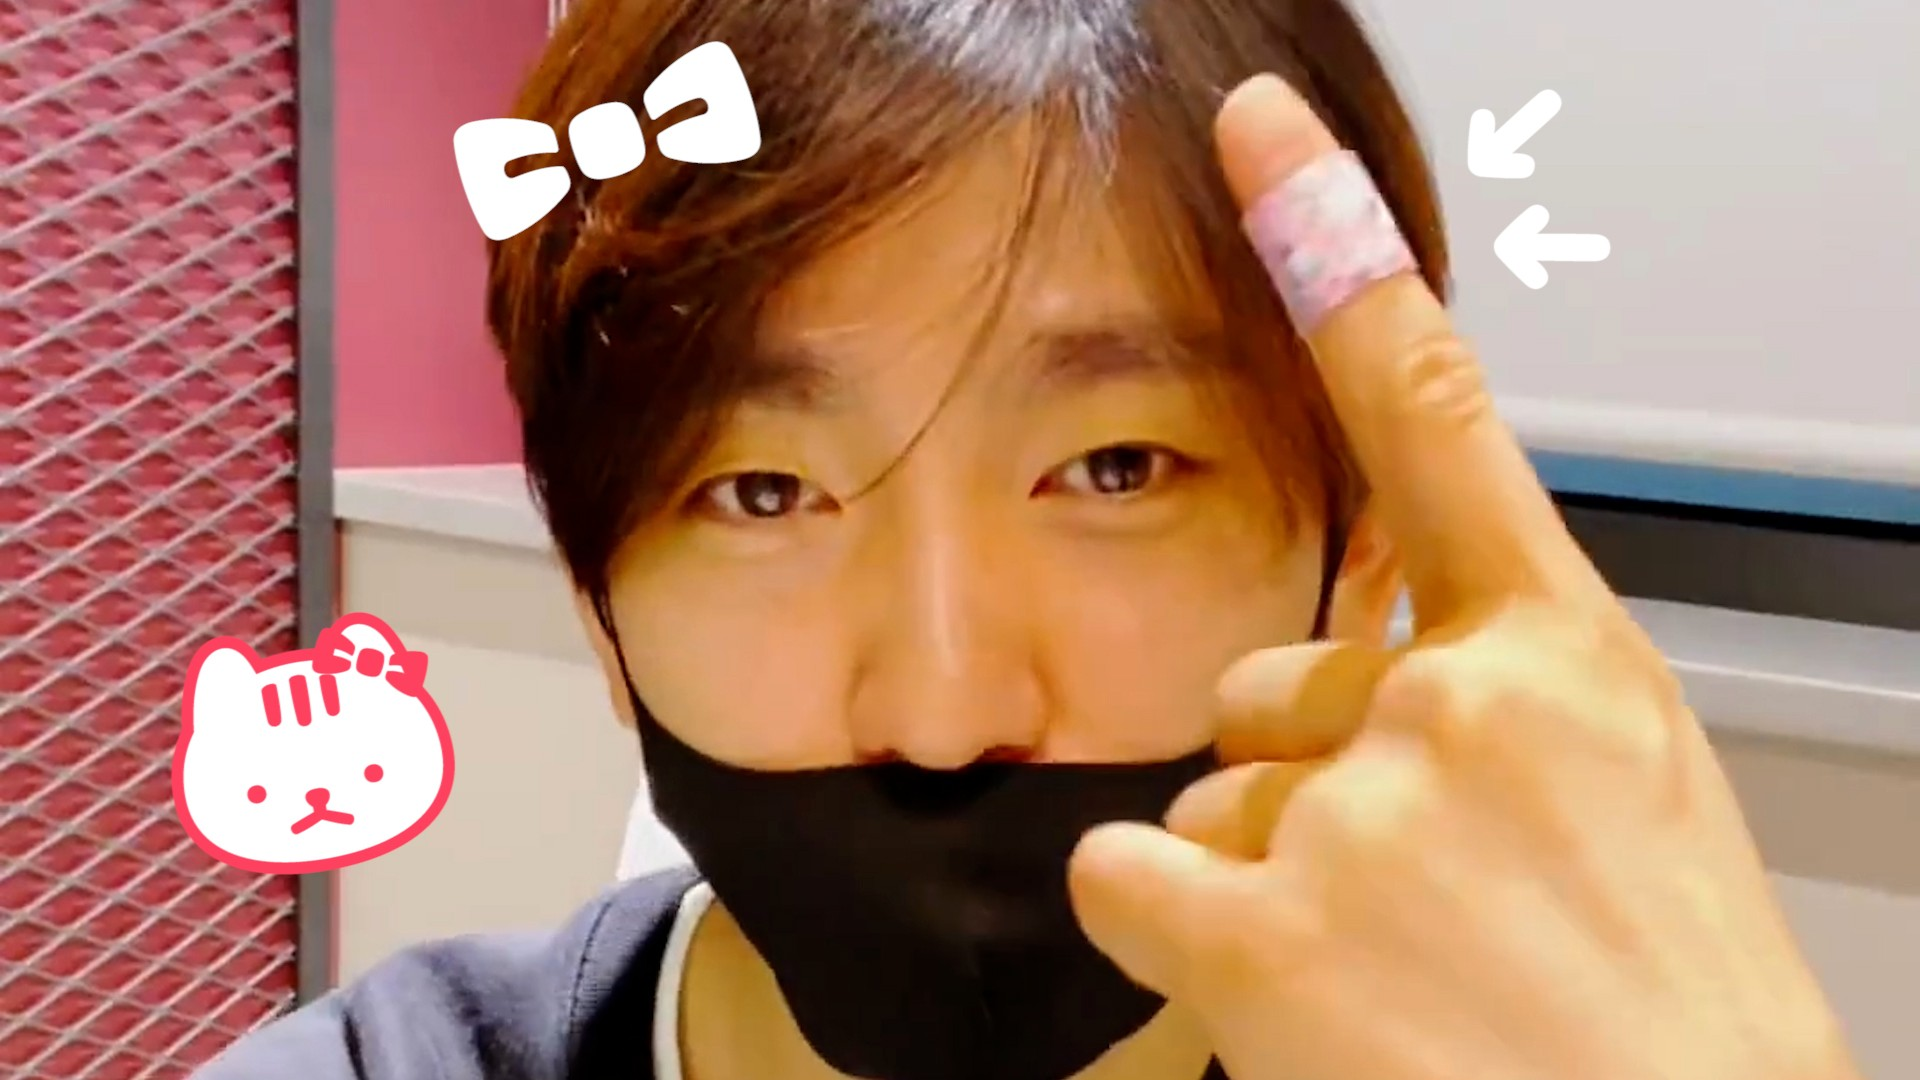 [GOT7] 반창고 있어요?🚑 아뇨 녕긔탱긔냥긔밖에 없어요😻💚 (HAPPY JINYOUNG DAY!)